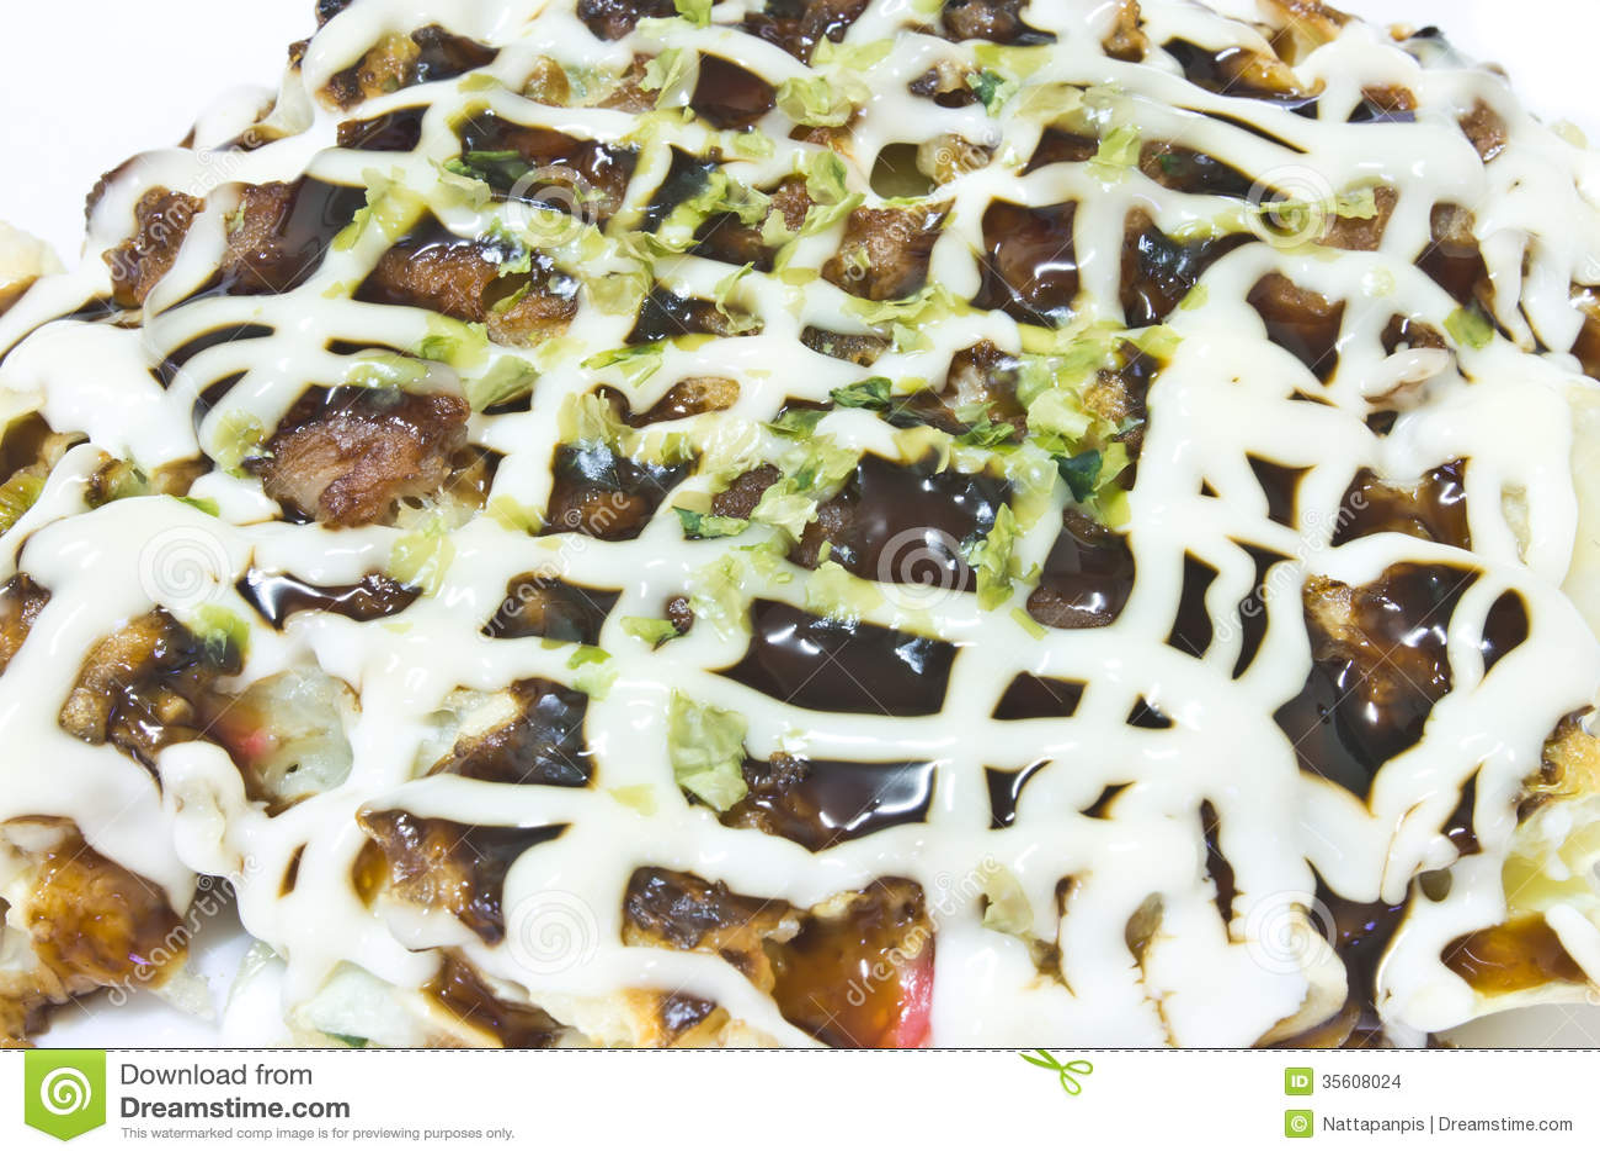 Okonomiyaki, japanese pizza, japanese food.